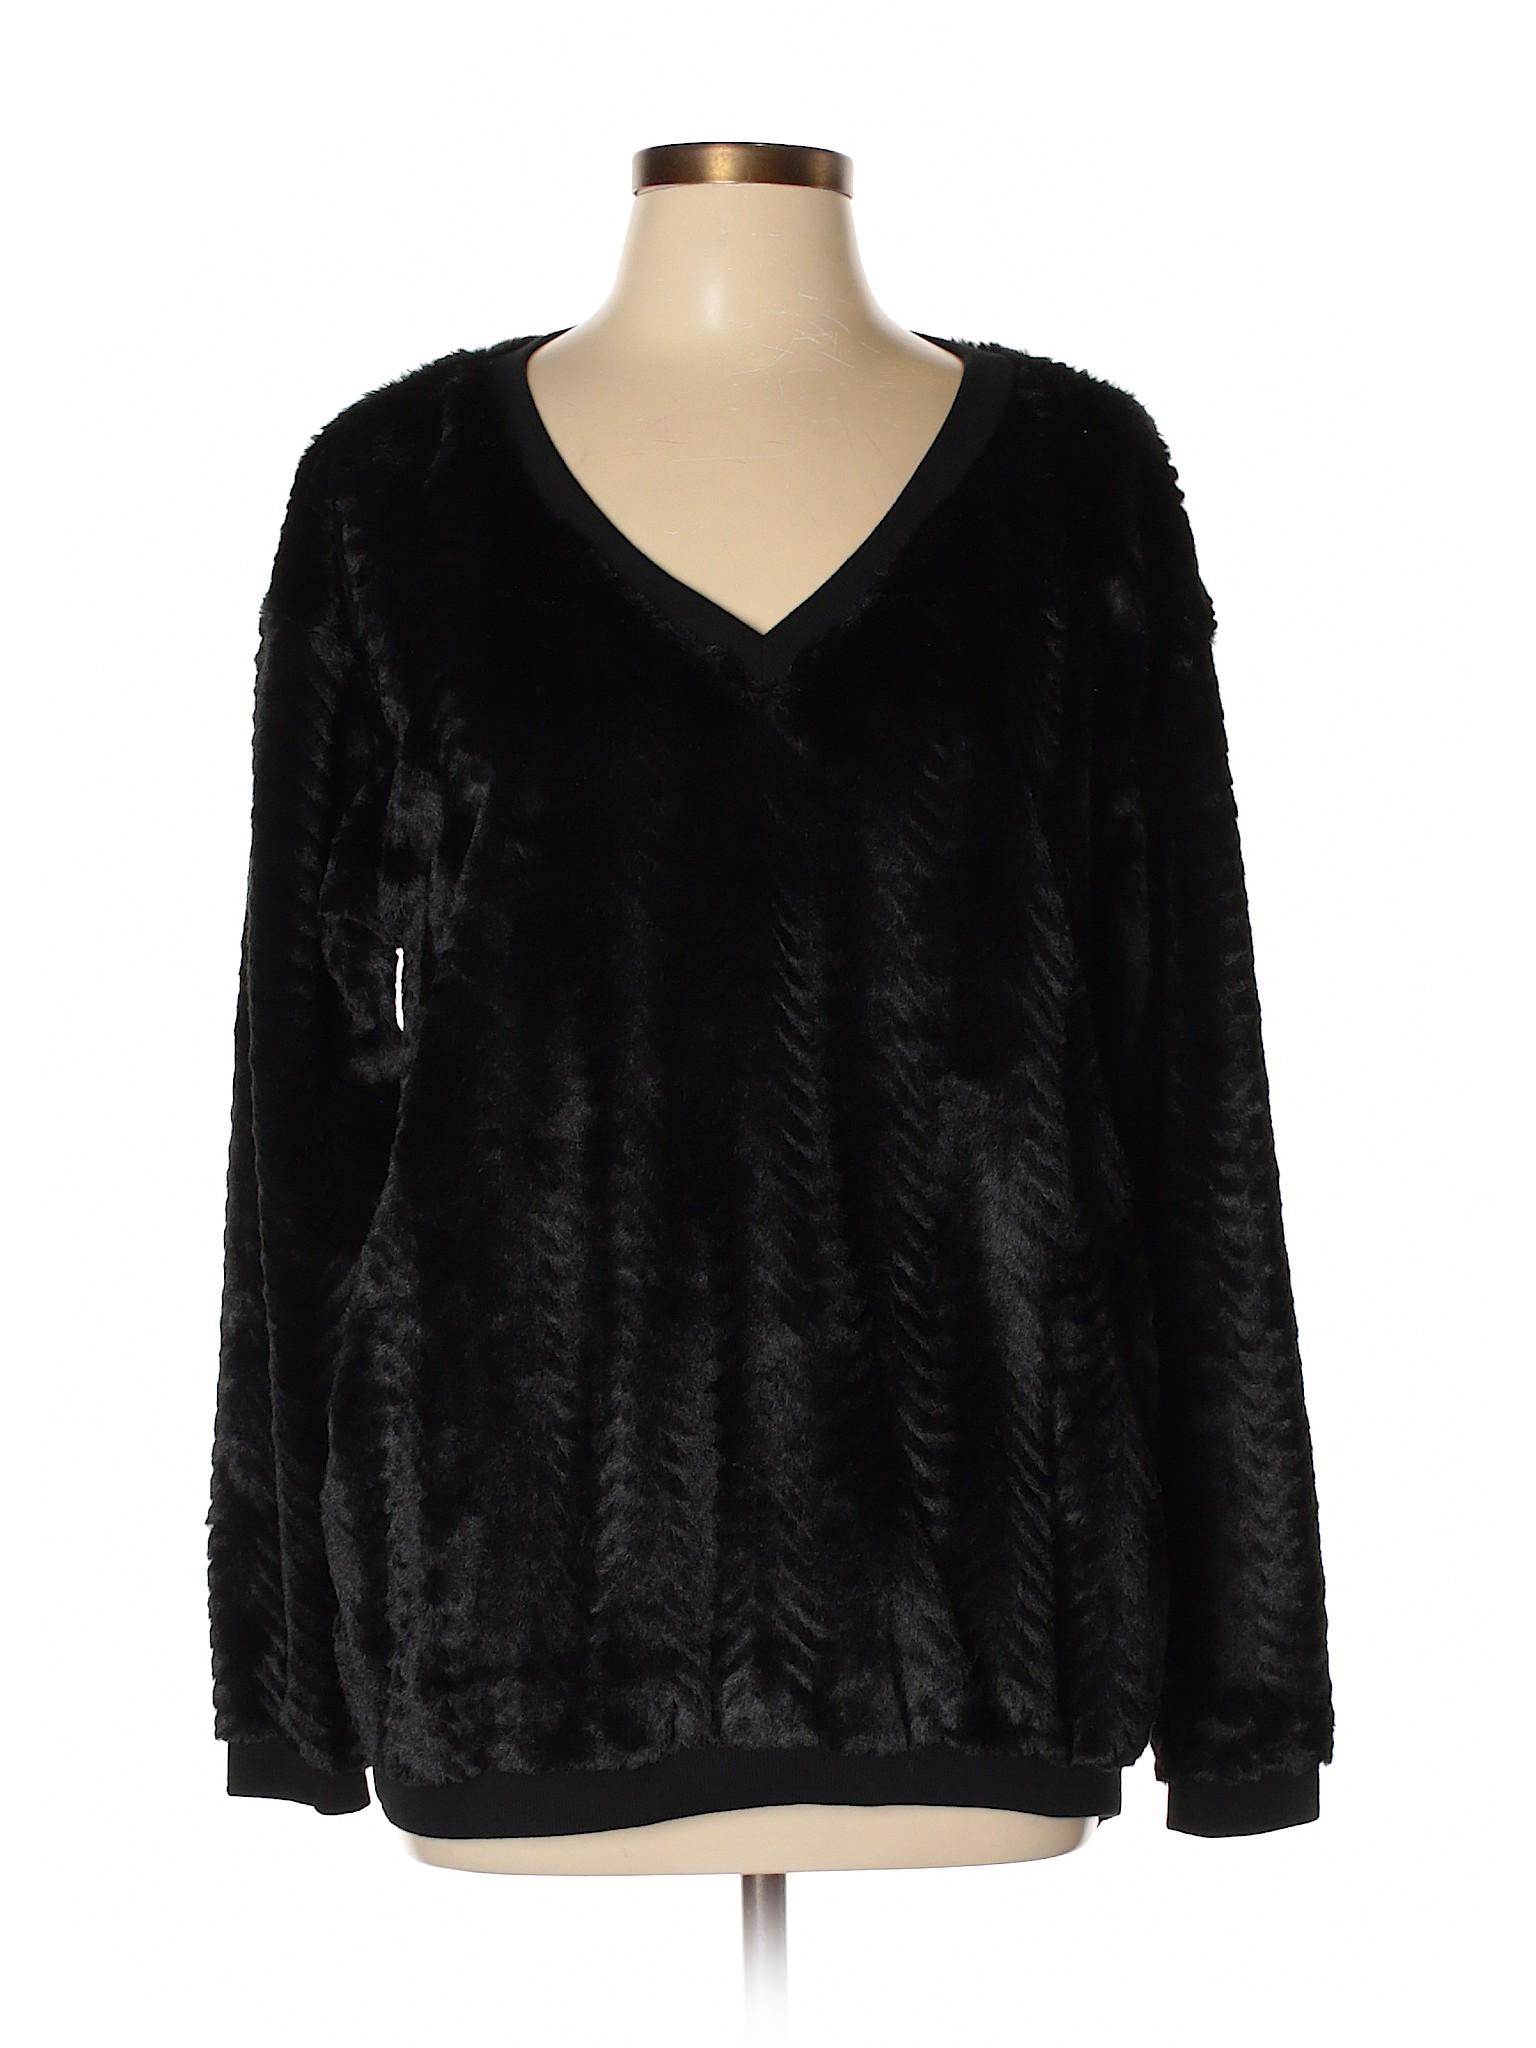 Sweater Boutique Eyelash Boutique Pullover Eyelash Couture RXqXB8r